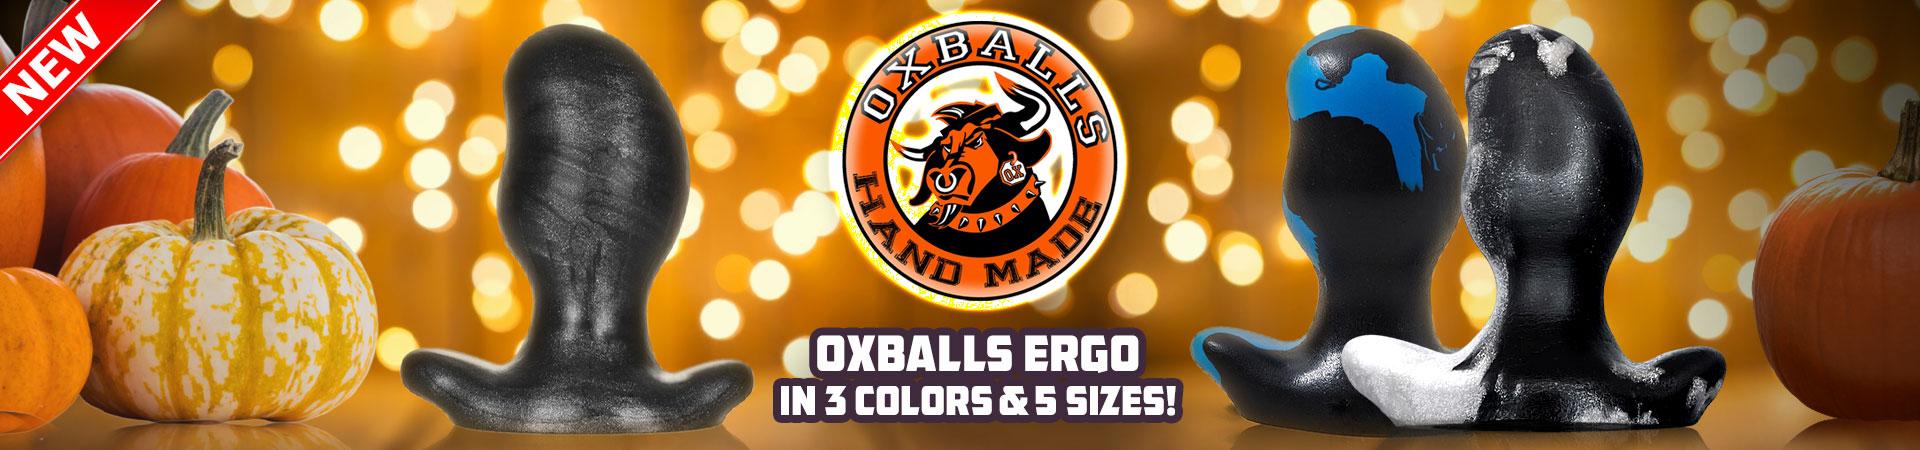 New Oxballs!